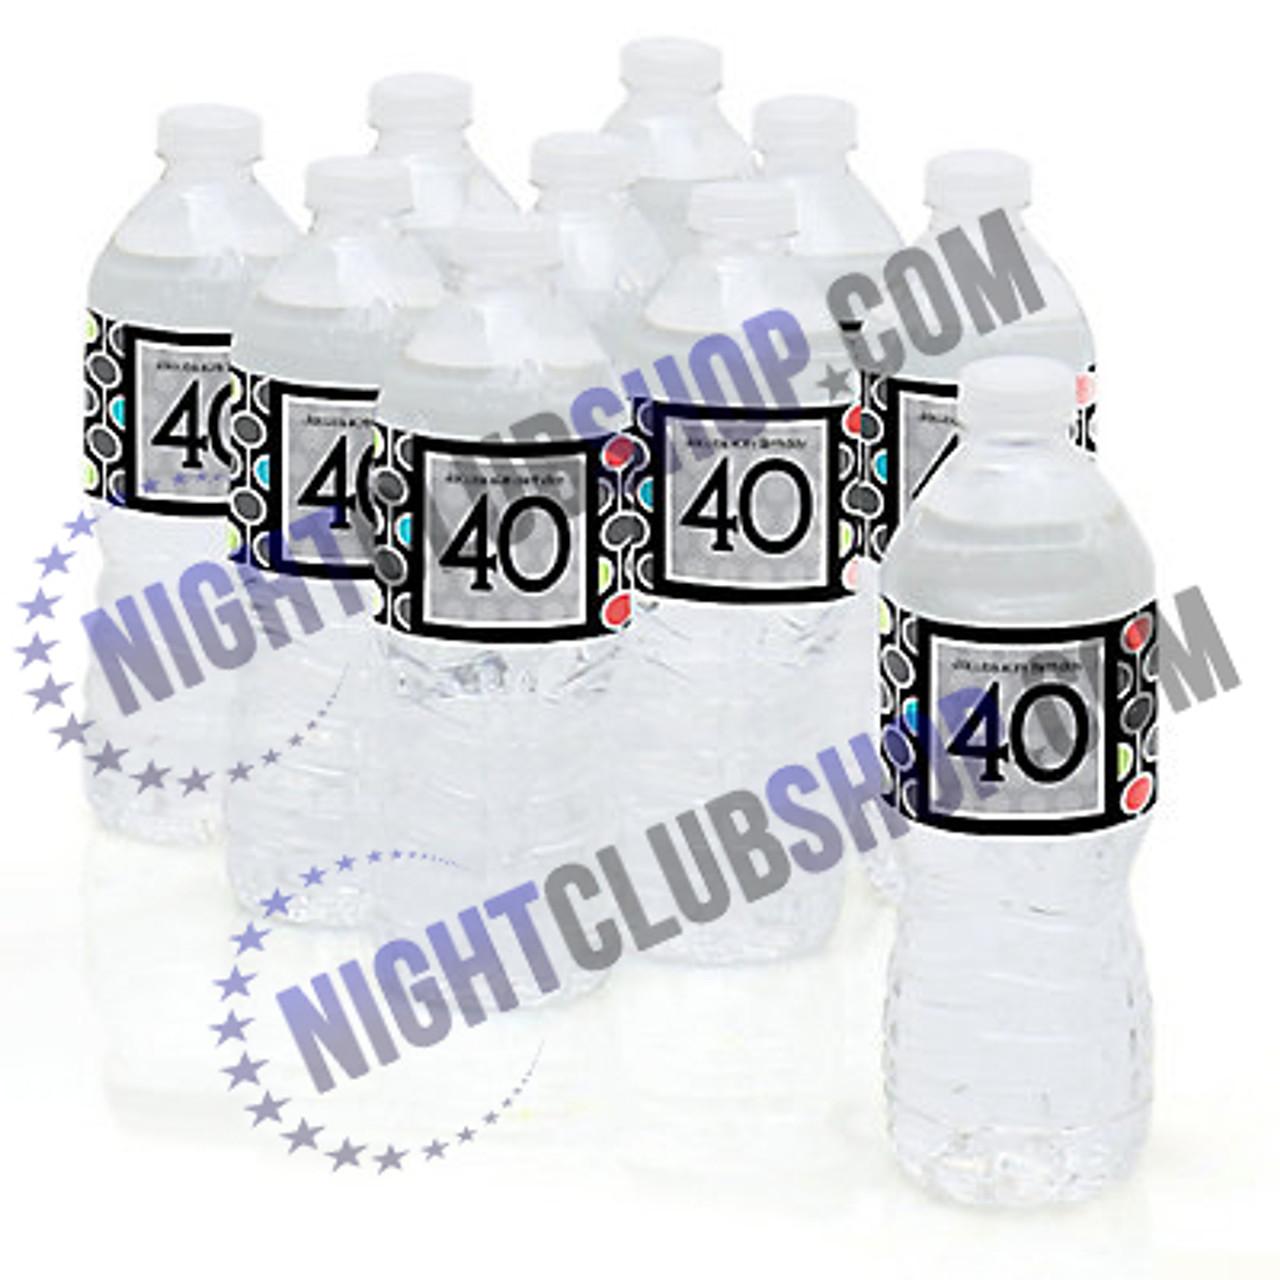 "CUSTOM WATER BOTTLE SELF ADHESIVE LABELS 1.25"" x 8.5"""